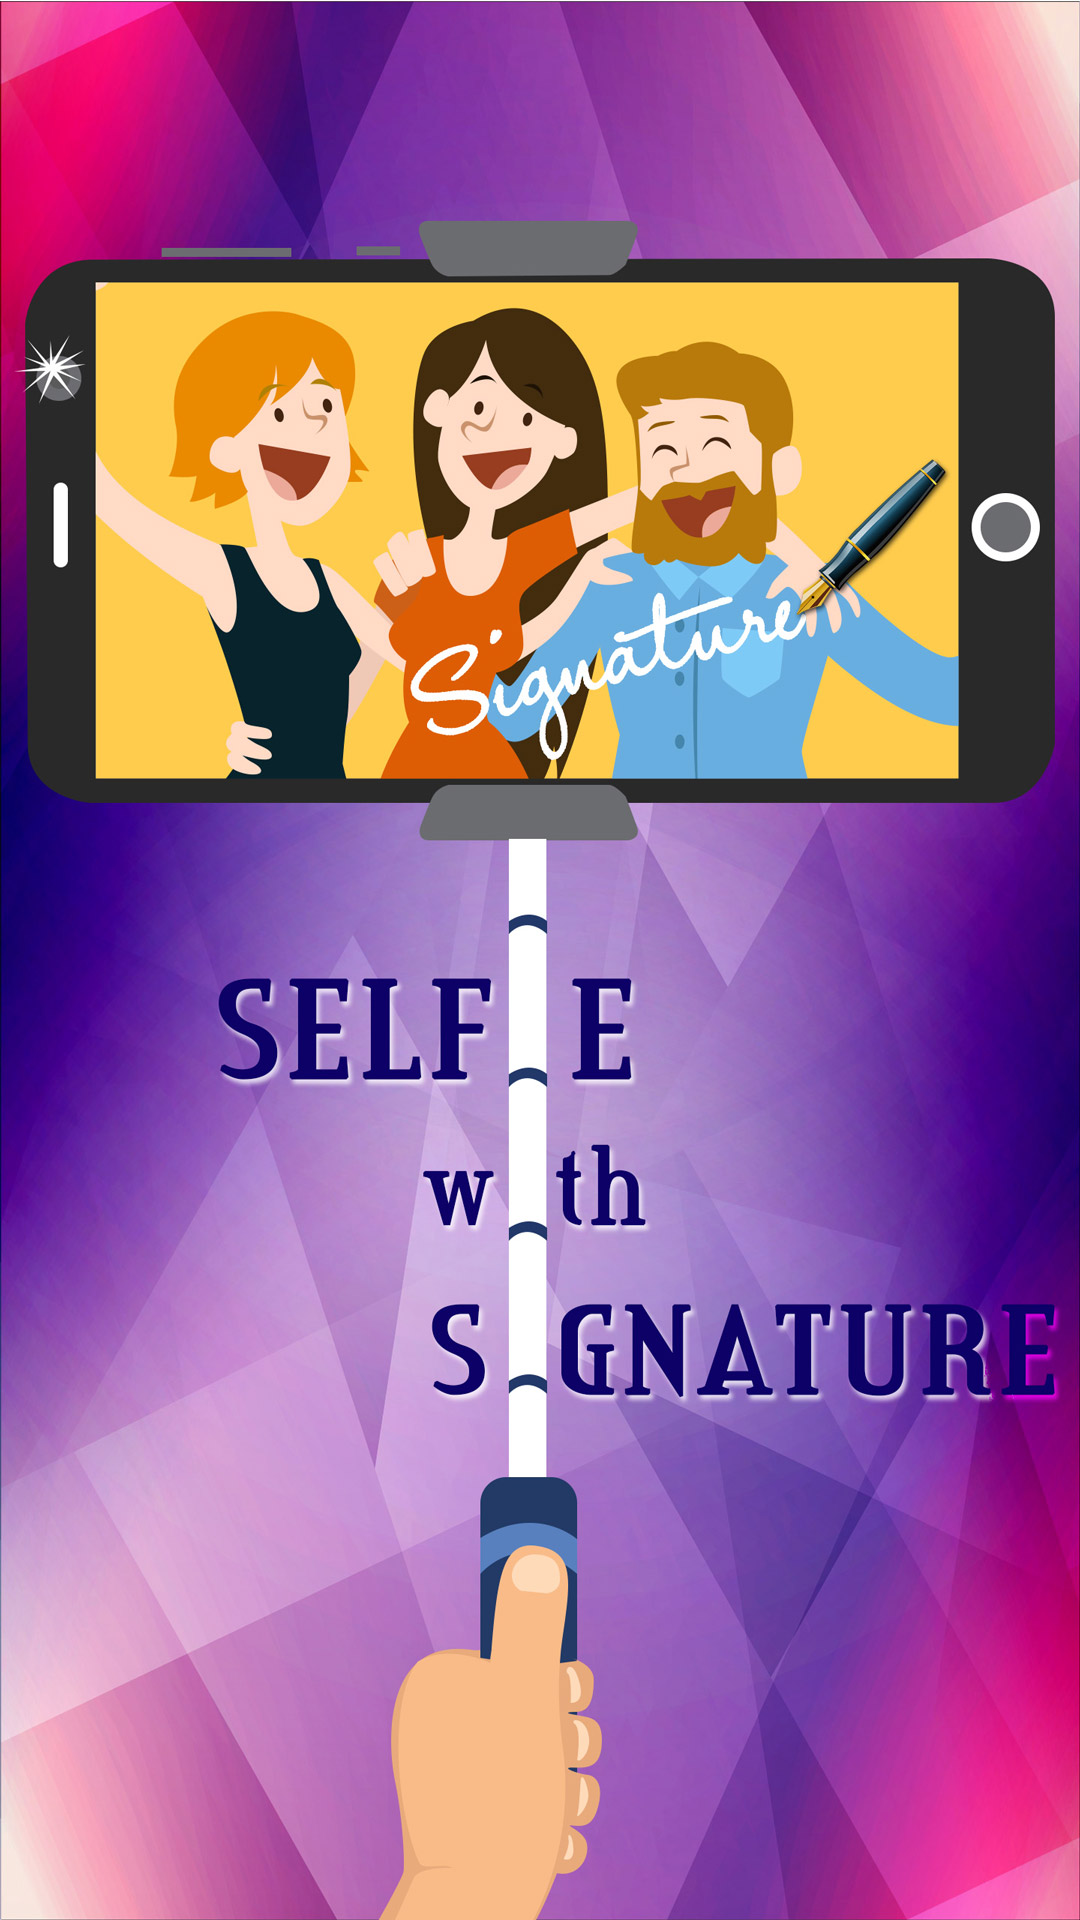 Selfie with Signature